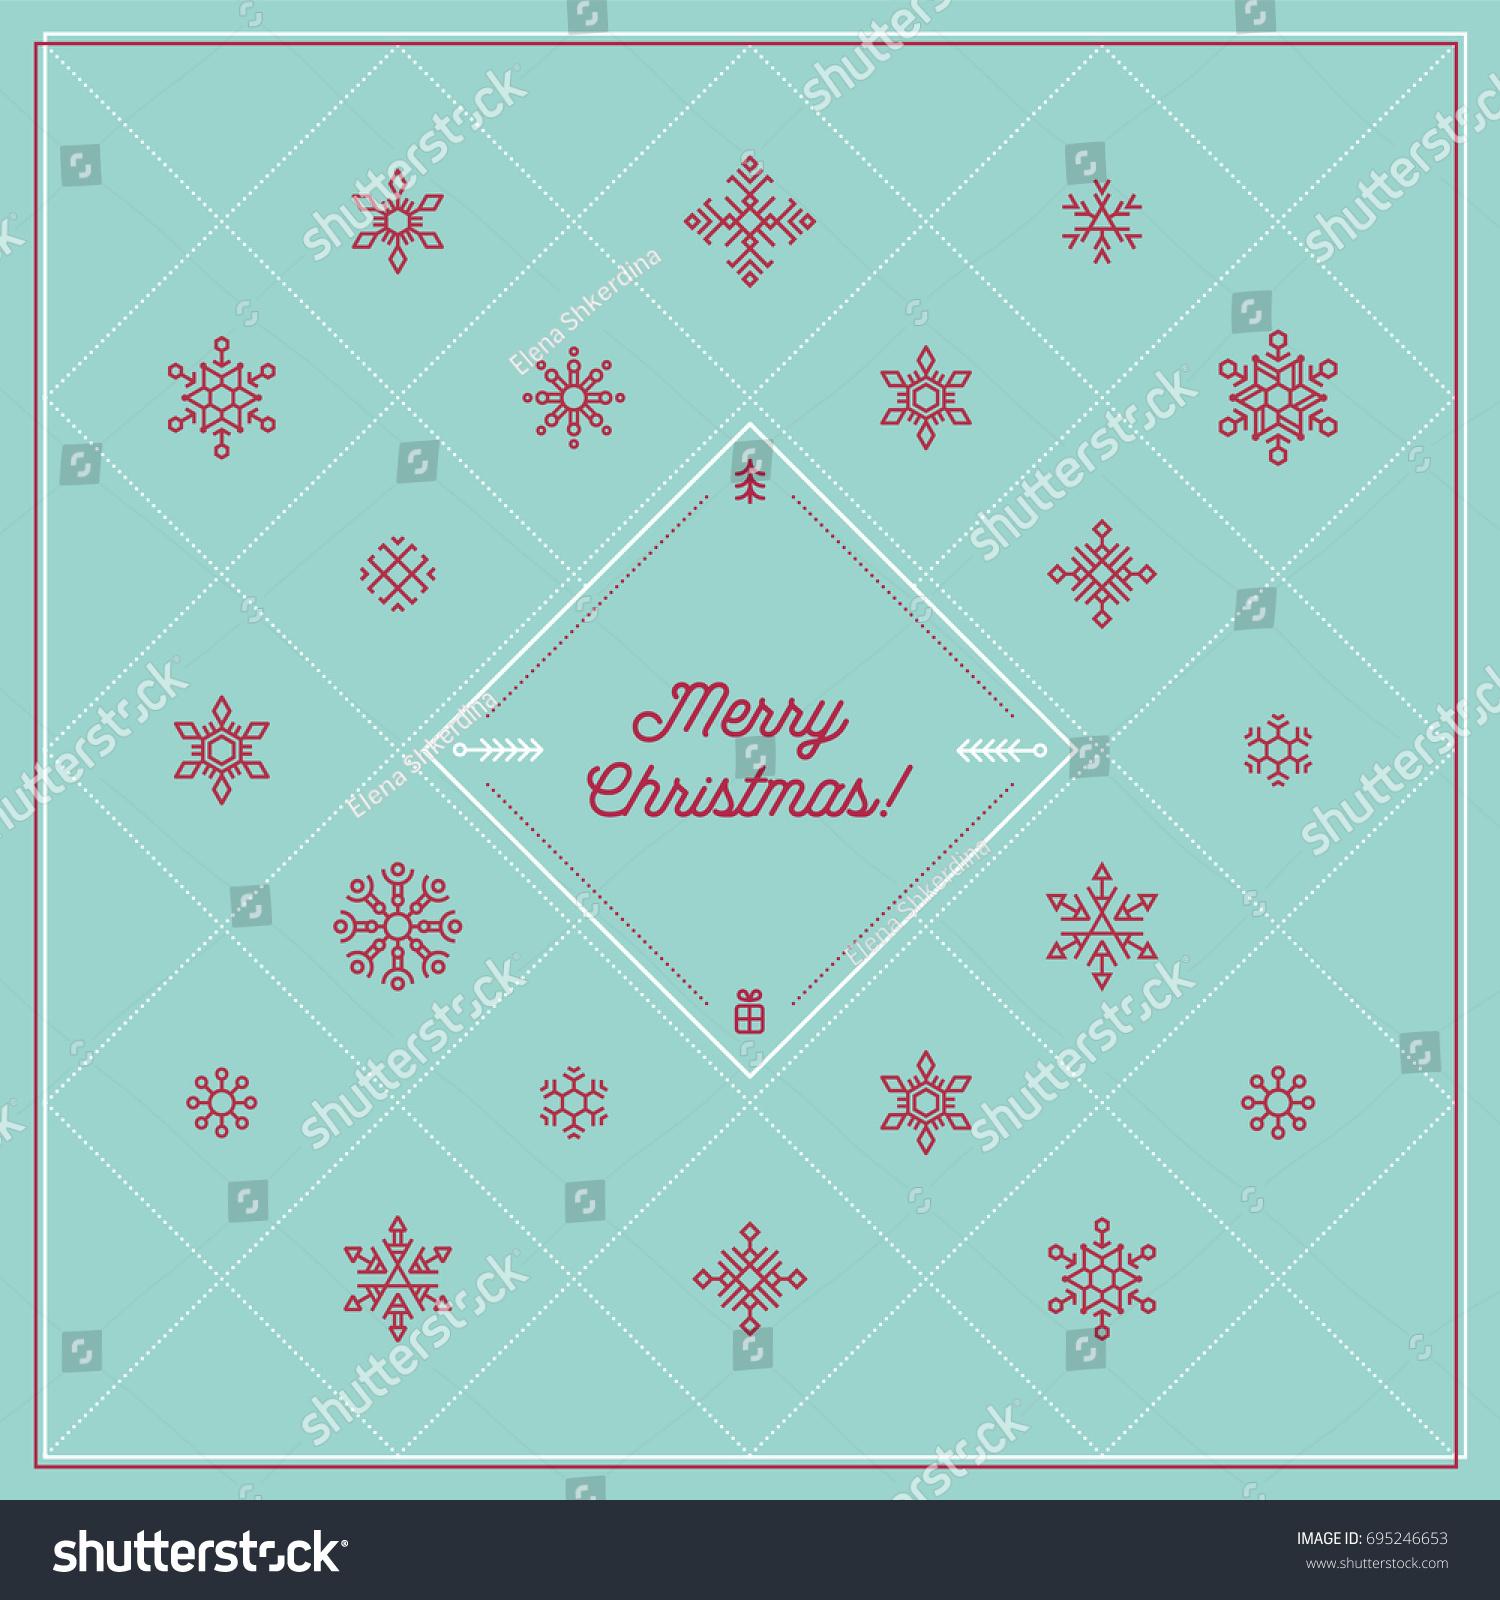 Neat Corporative Greeting Christmas Card Motivating Stock